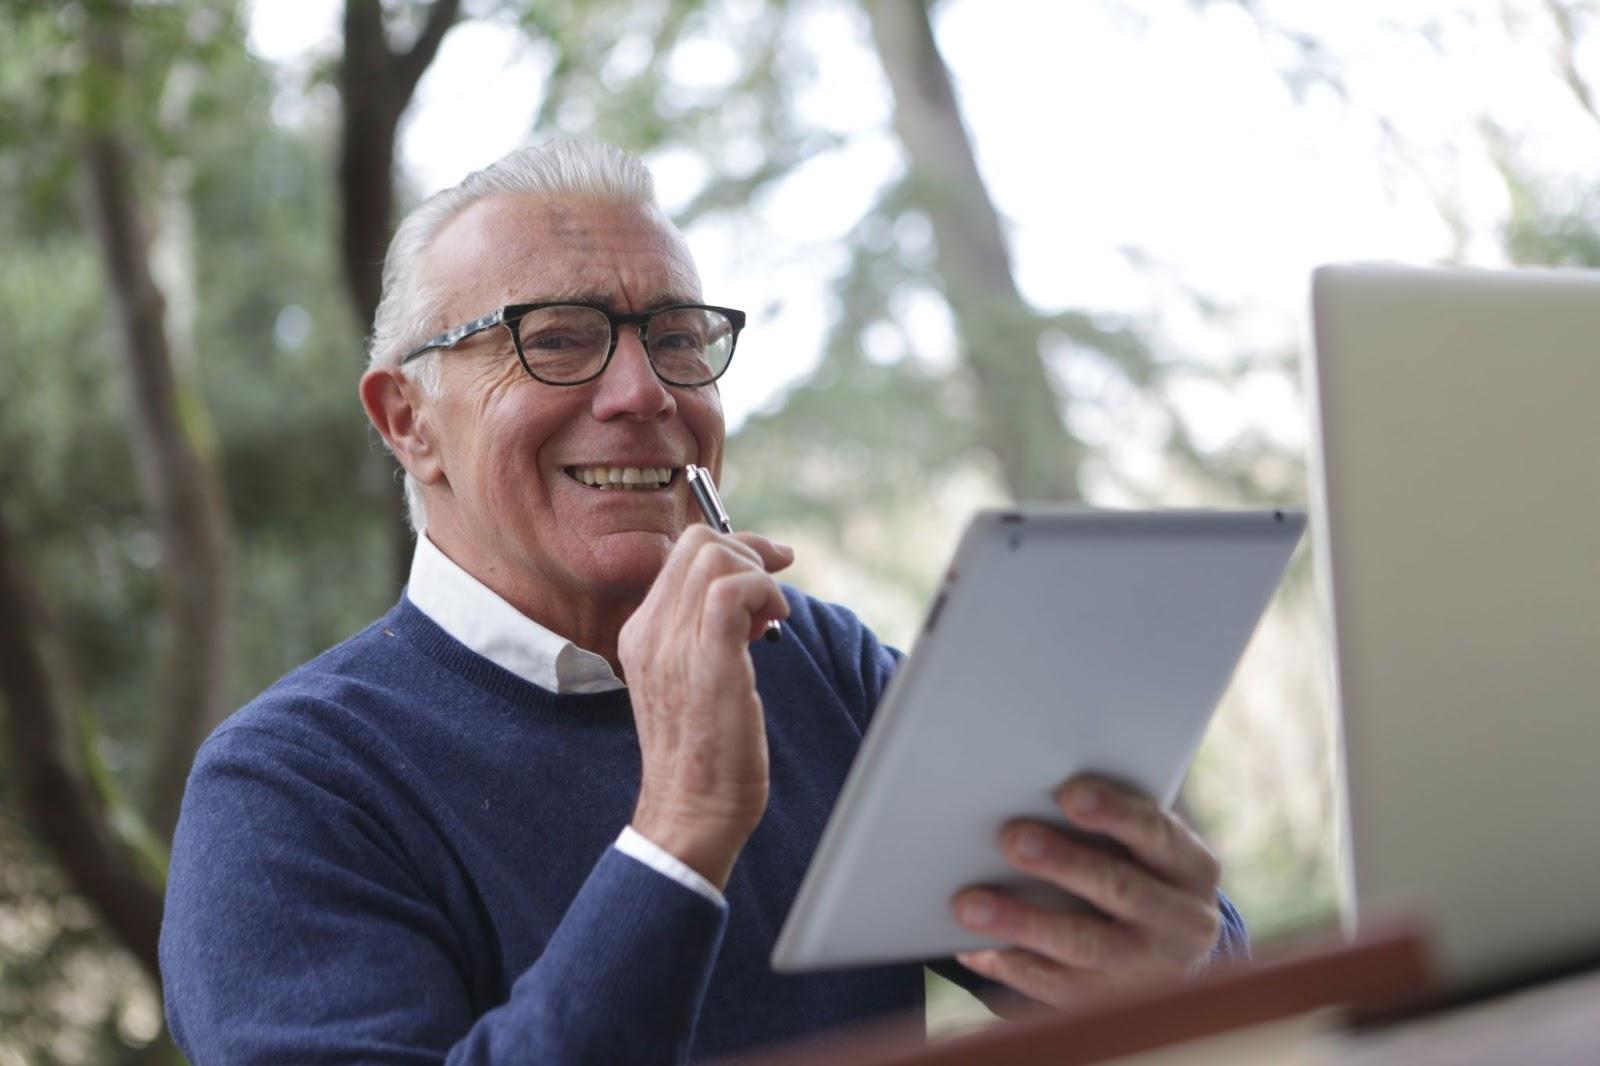 A retiree planning a successor